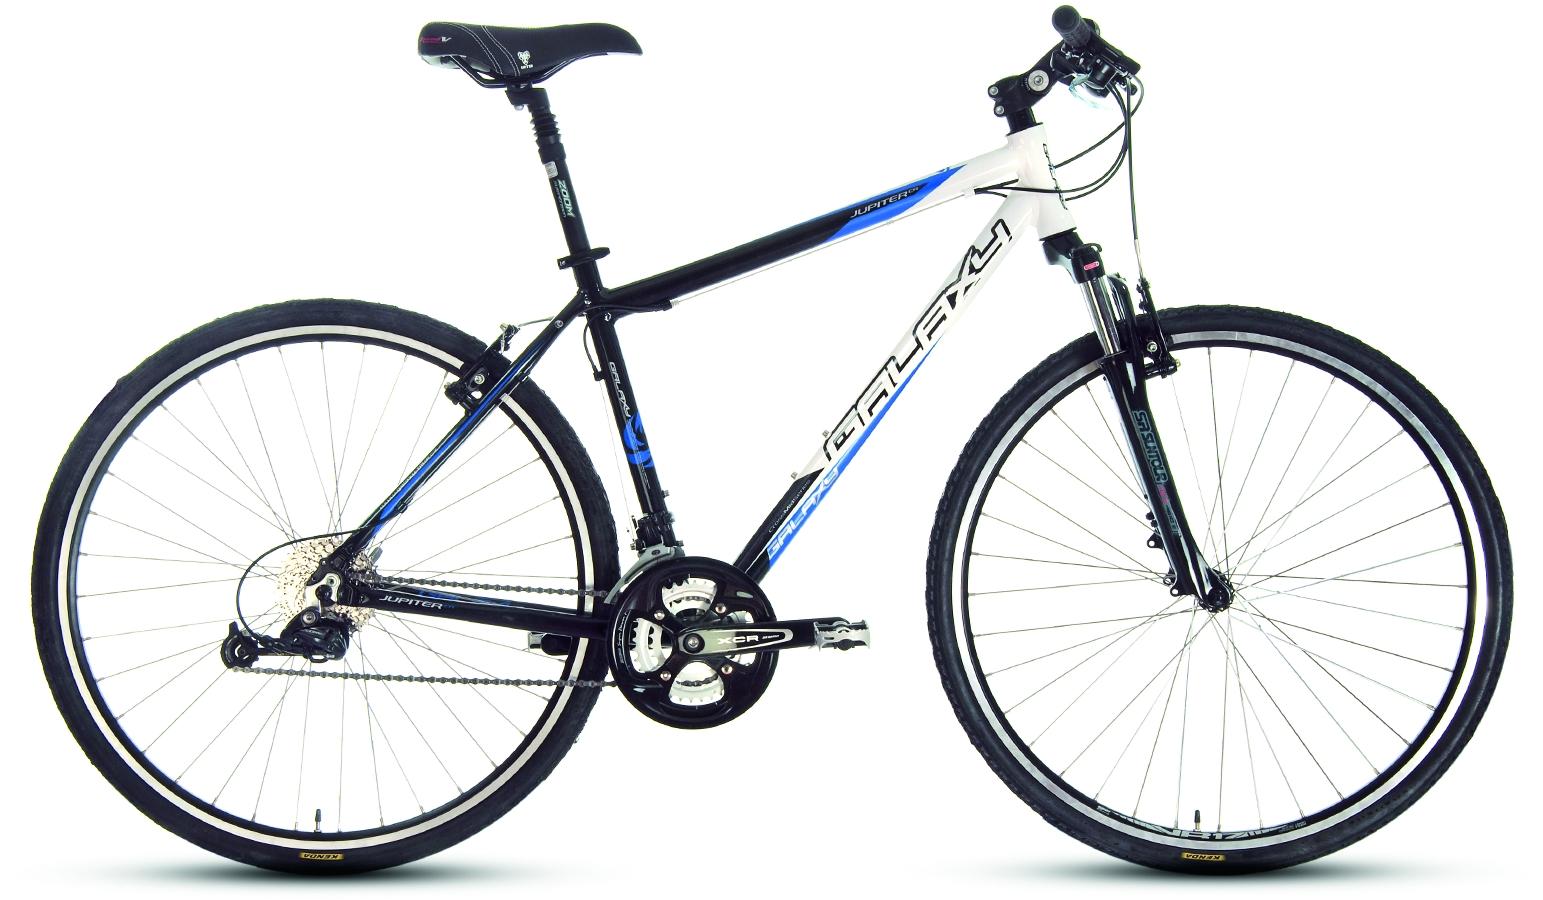 Electric Bicycles For Sale >> Cross bike GALAXY JUPITER CROSS 2011 - inSPORTline